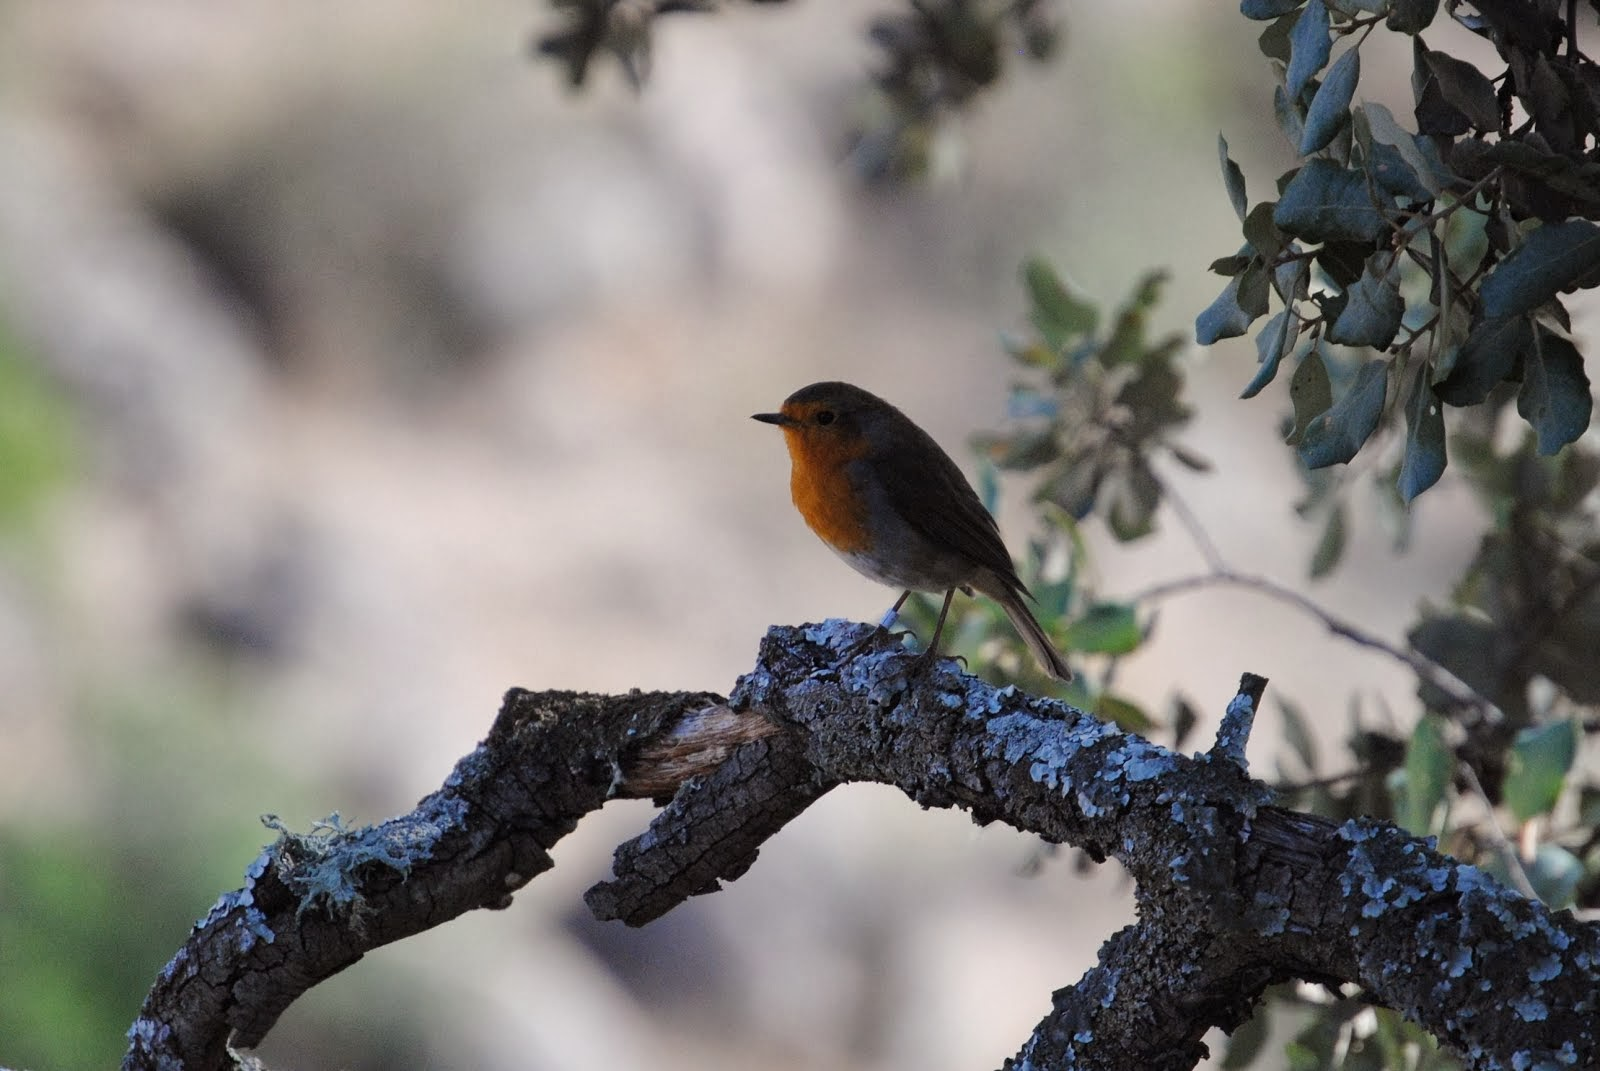 Enciclopedia de las Aves de La S.E.O.